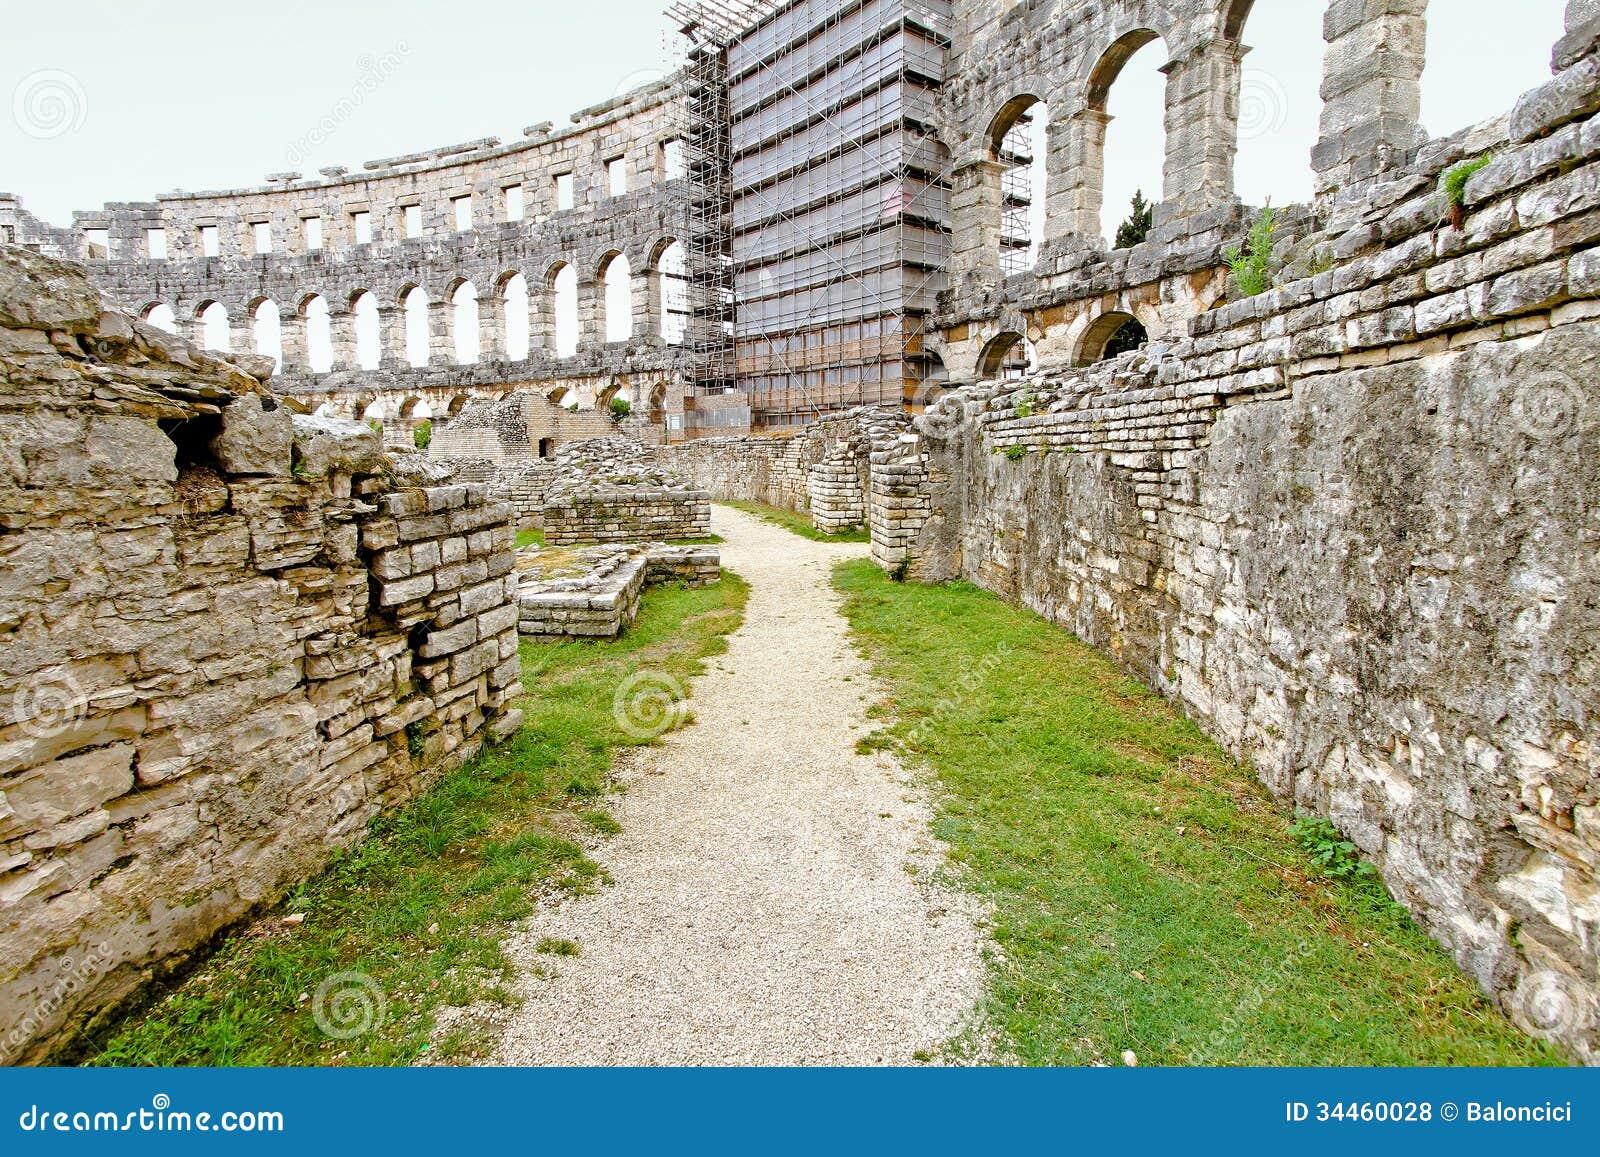 Arena Rome